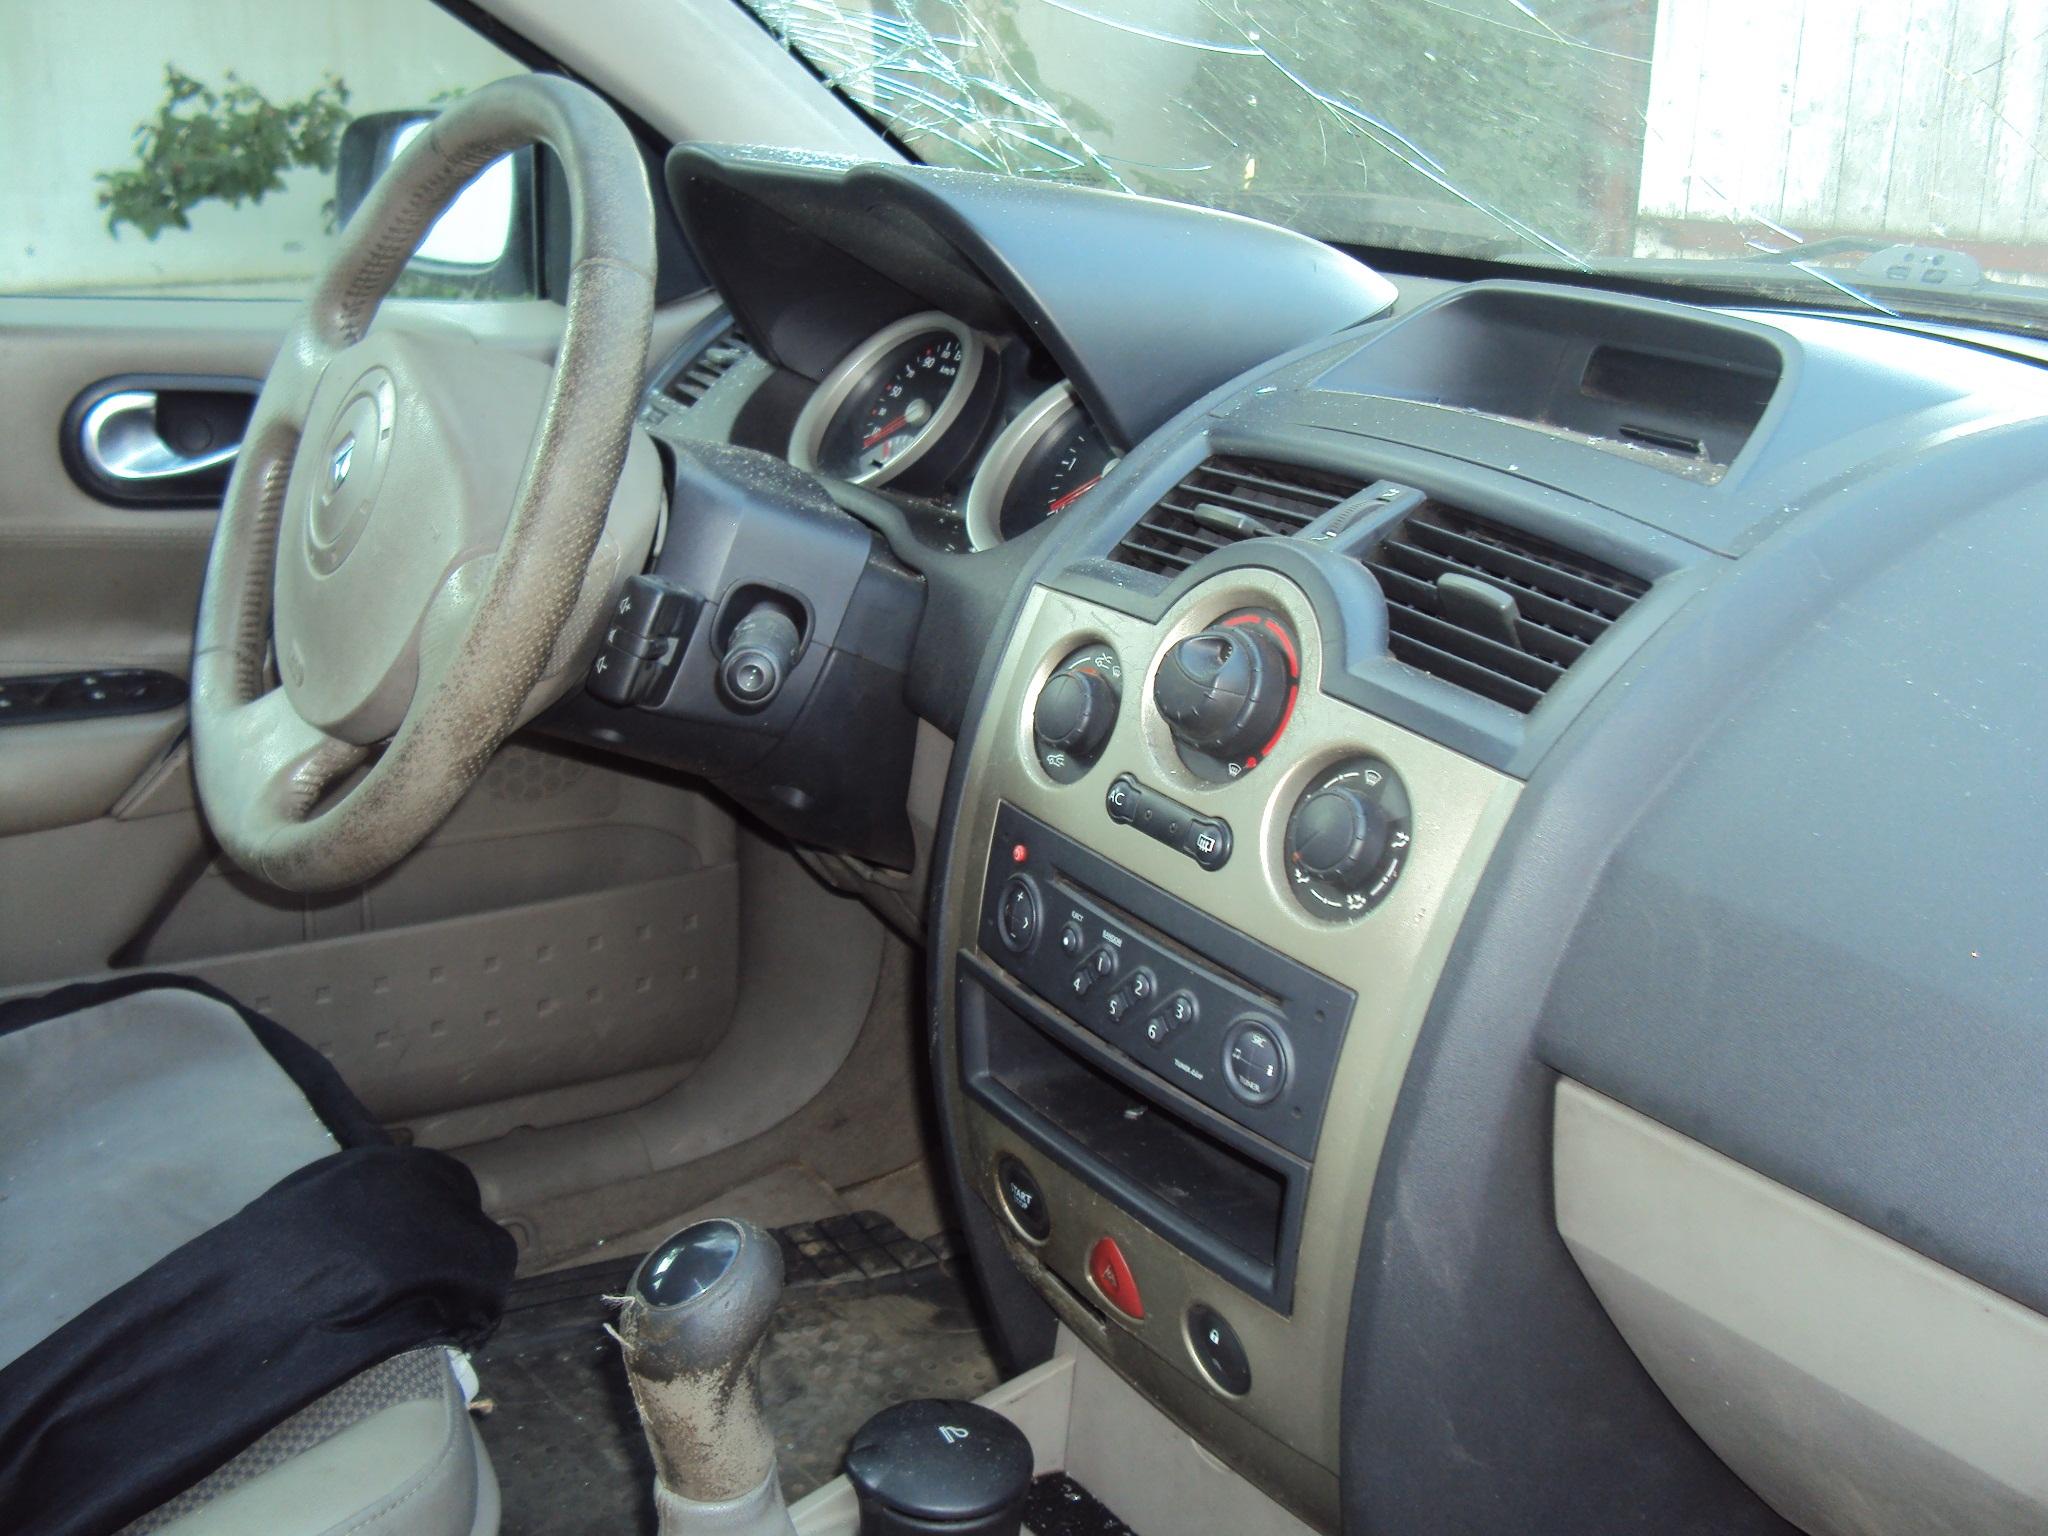 Renault Megane 2003 Interior Renault Megane Avariat 2003